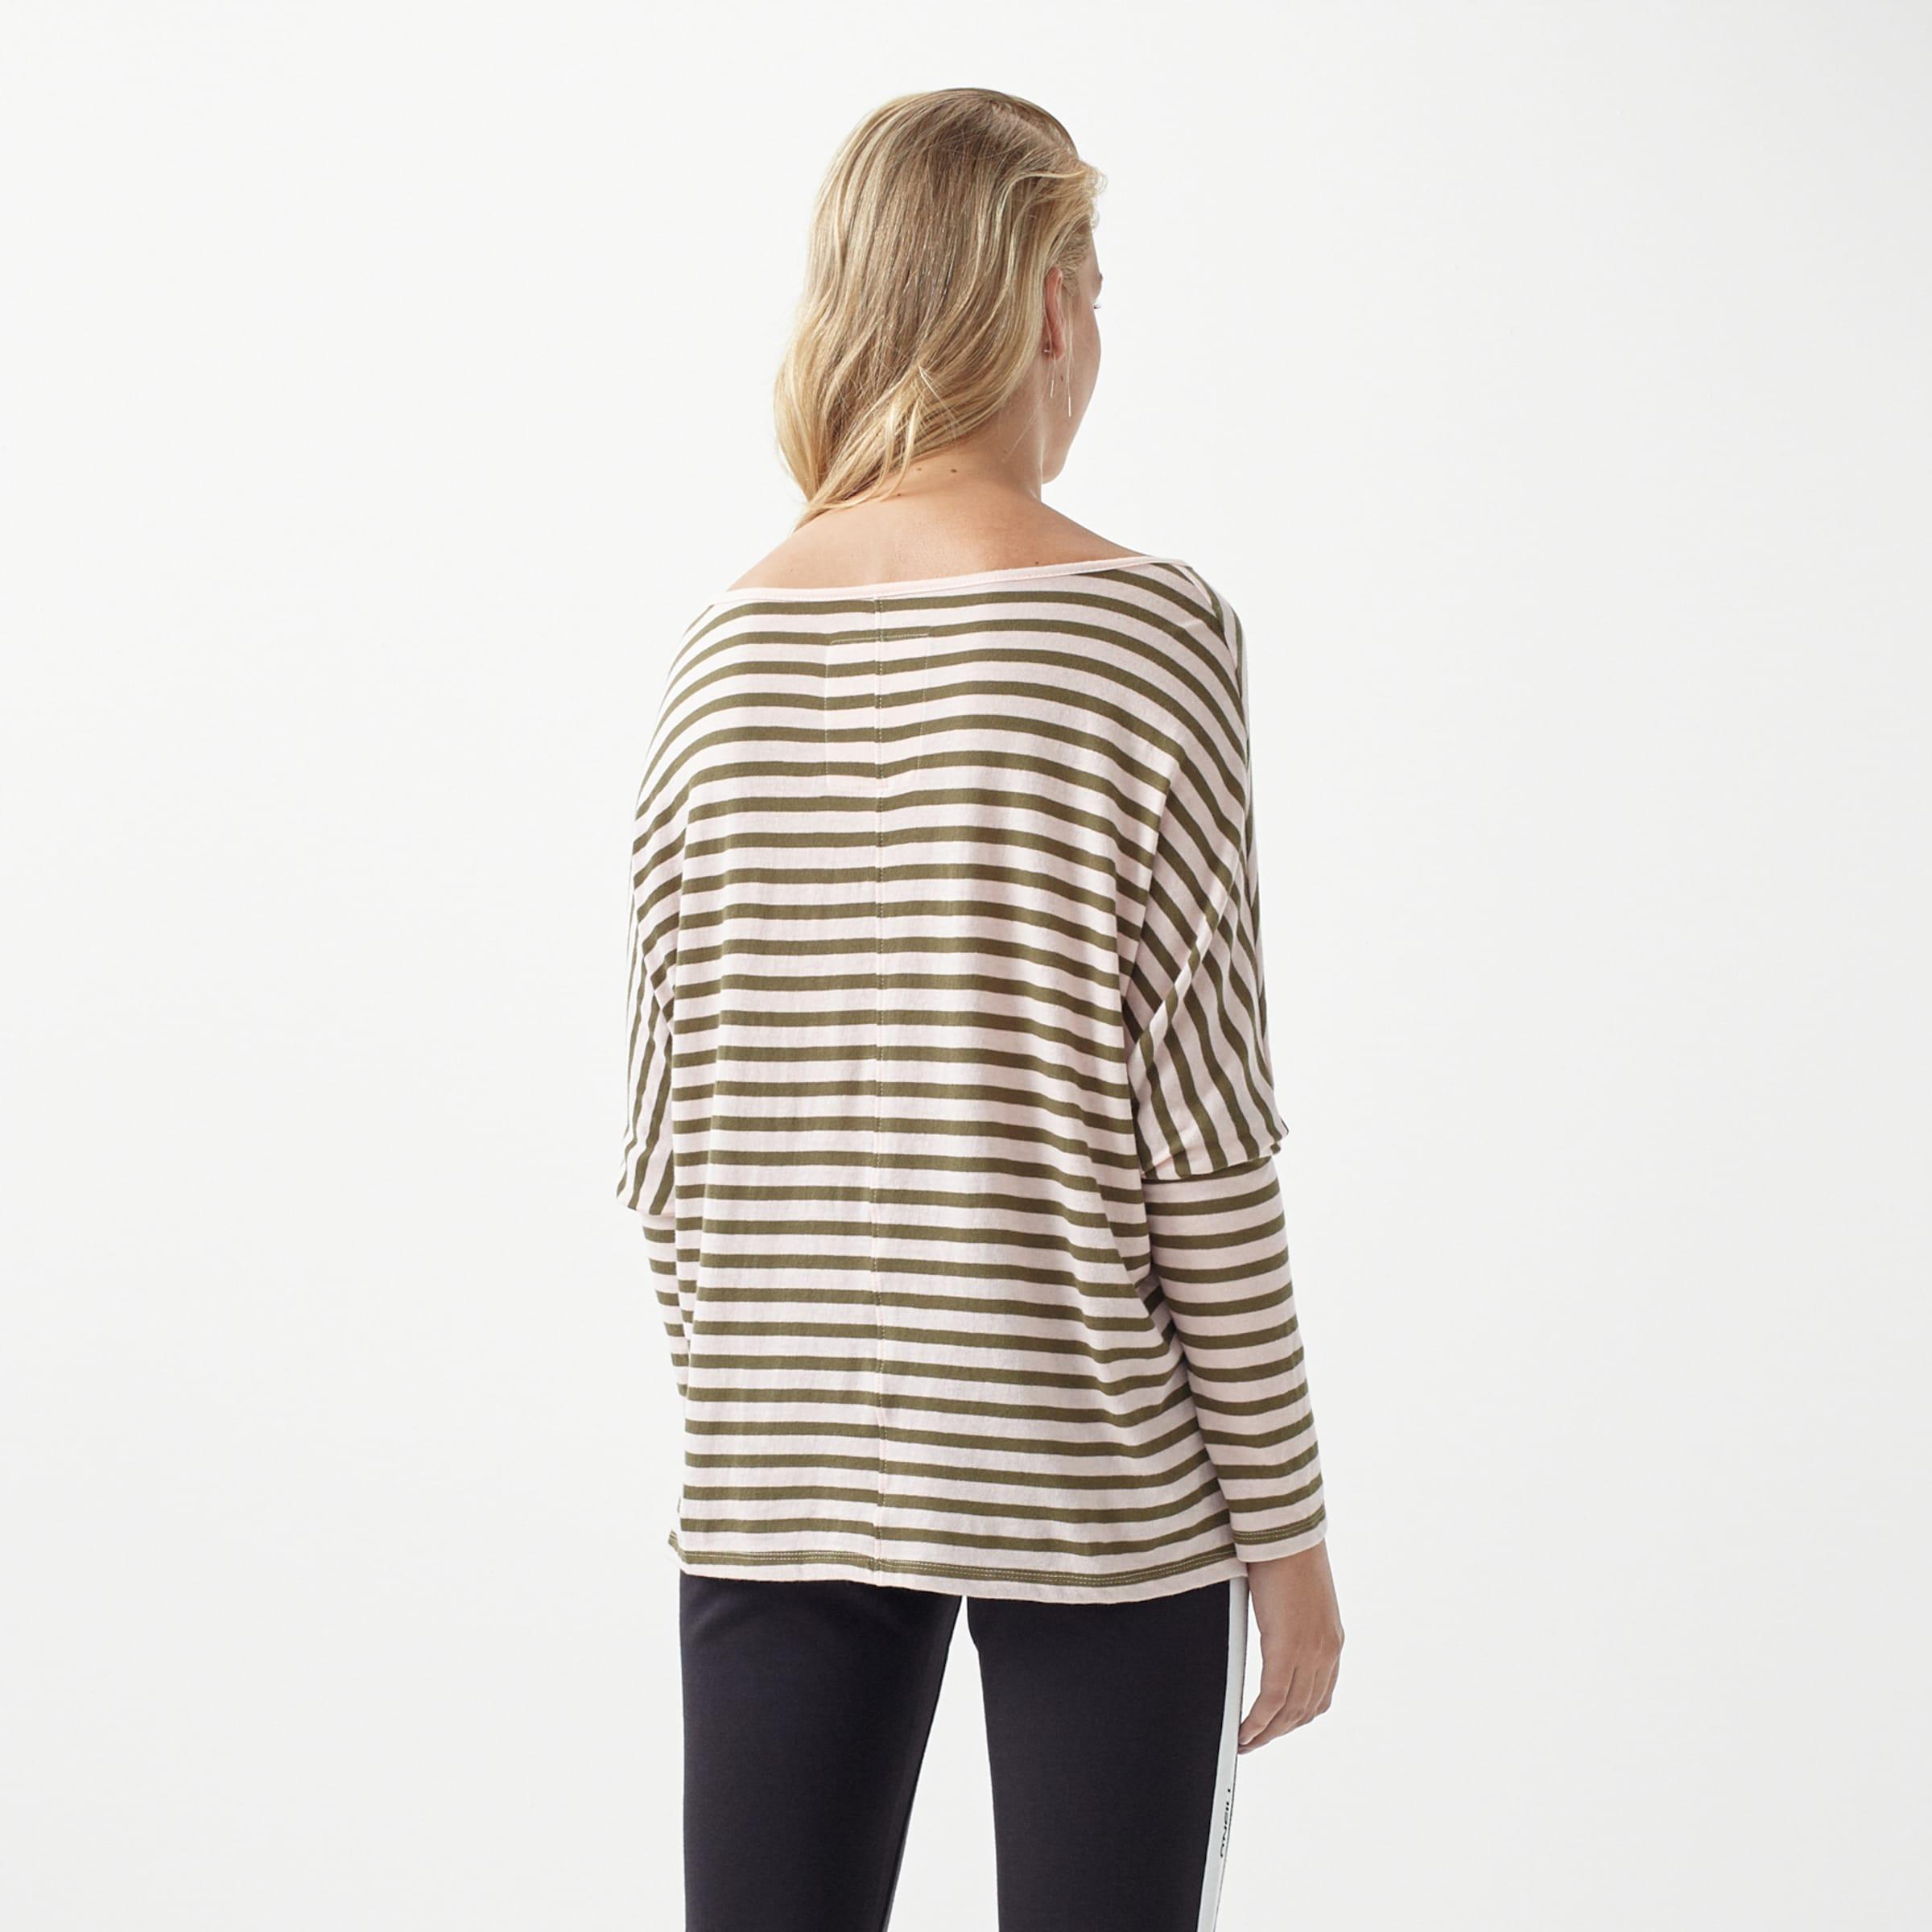 'lw Striped' In O'neill Ess Shirt OlivPuder dxroBCe